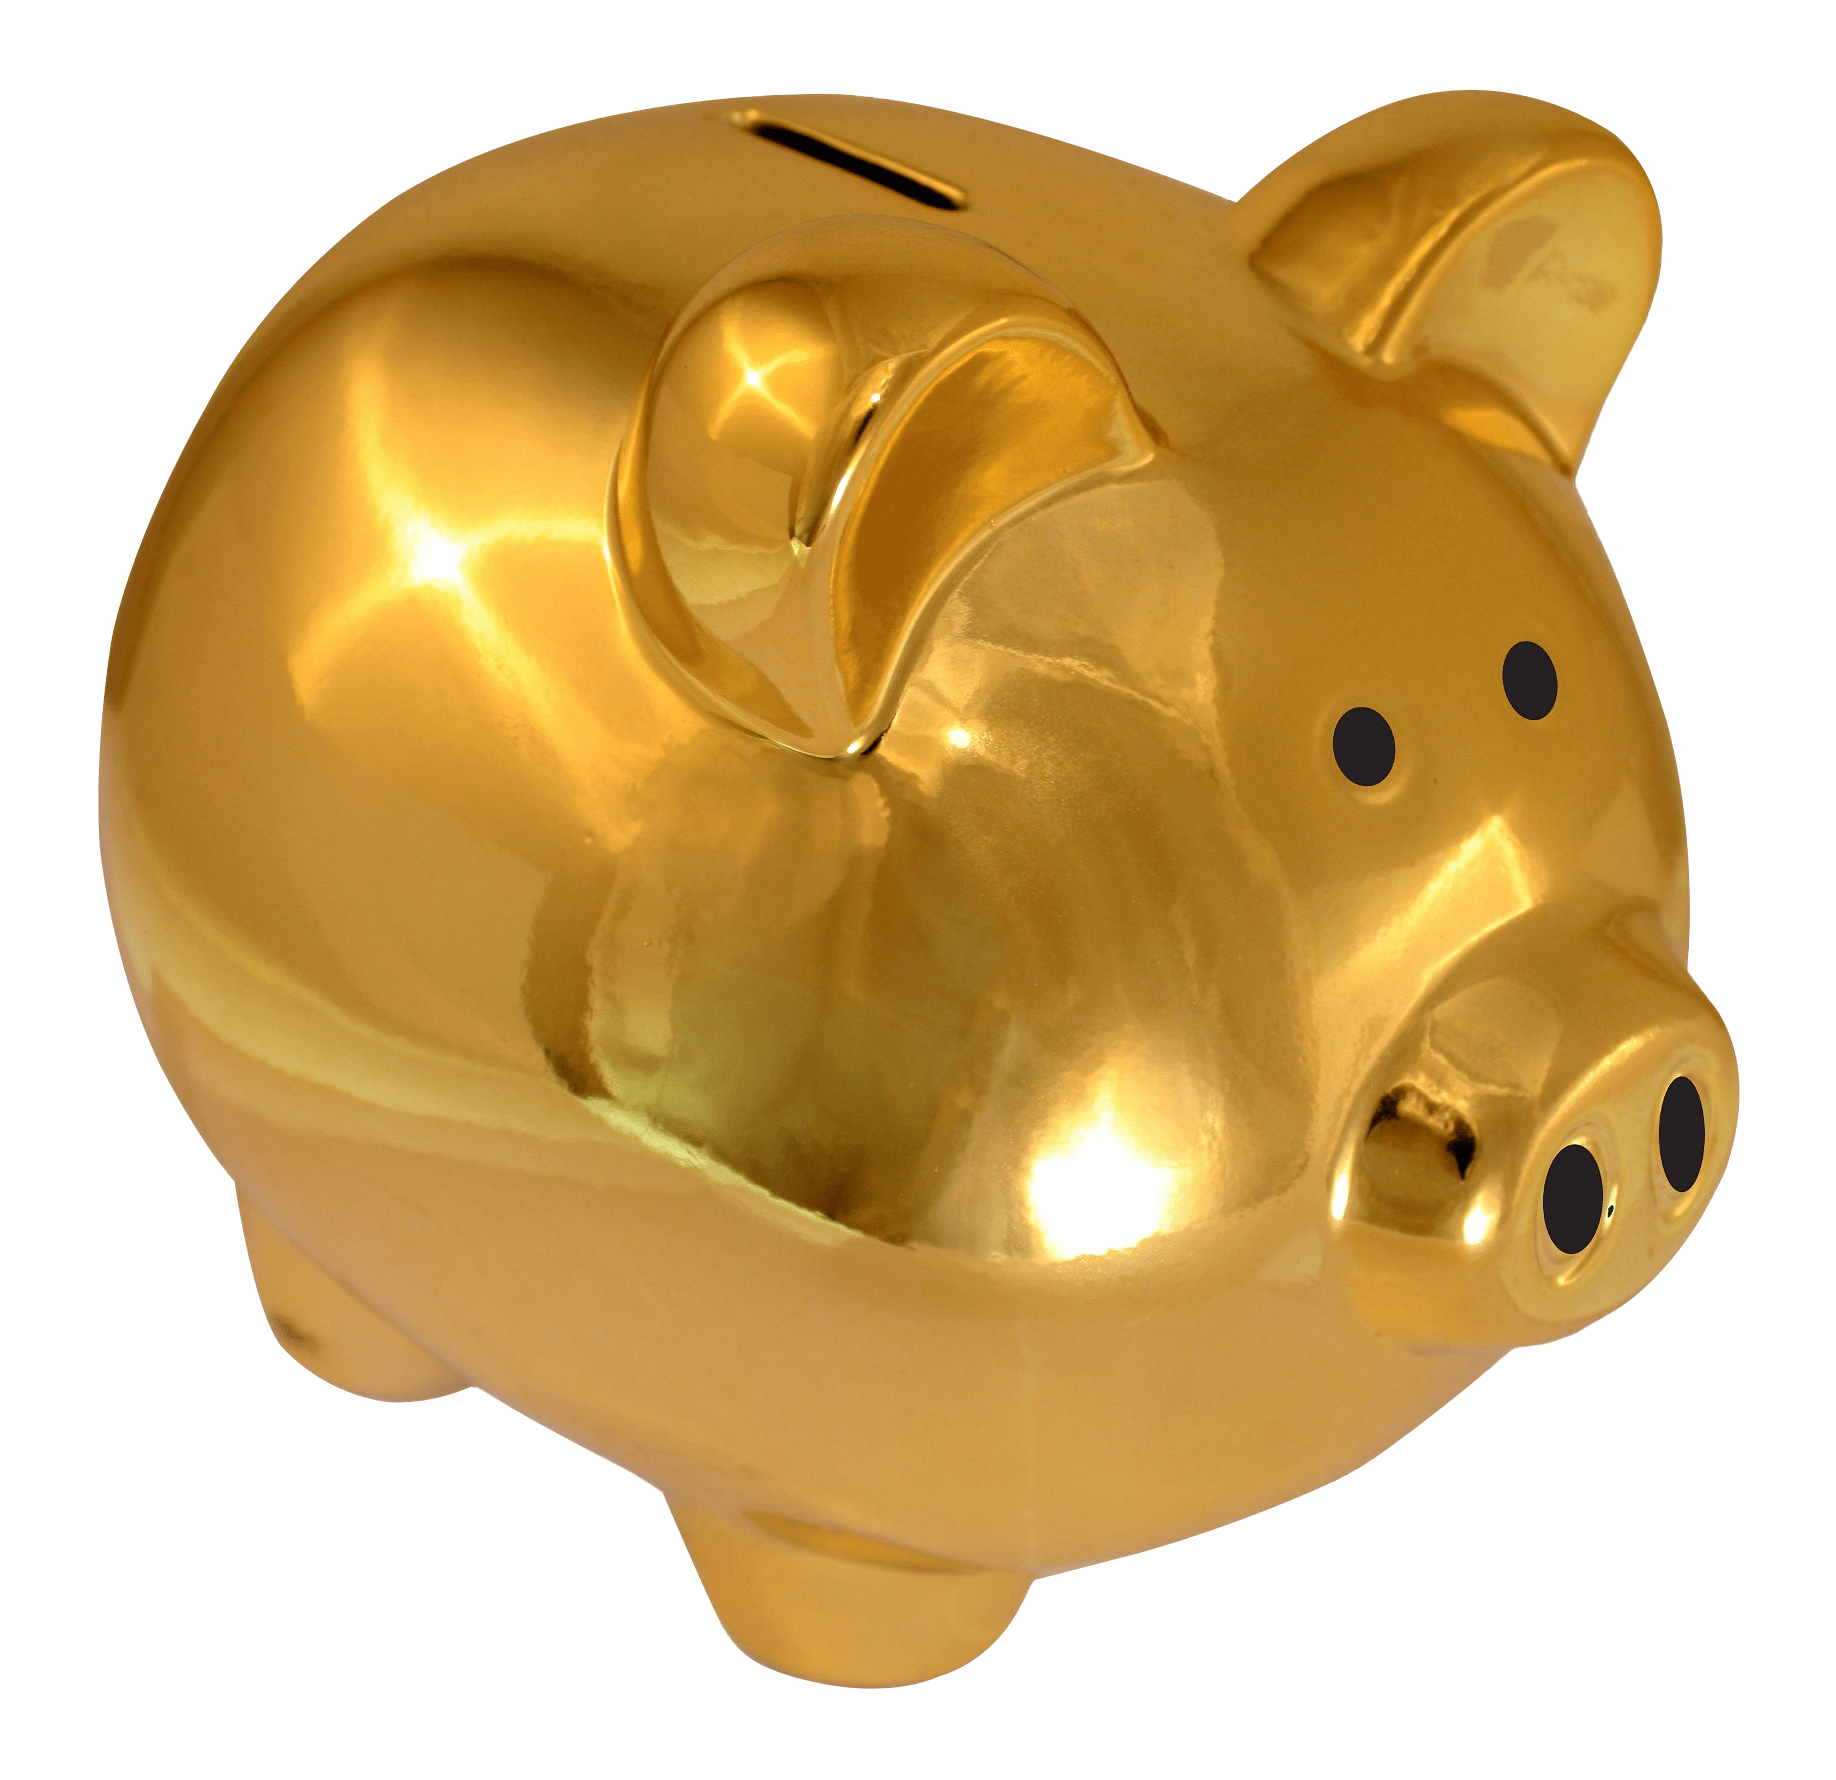 Coin clipart wow gold. Piggy bank transparent png